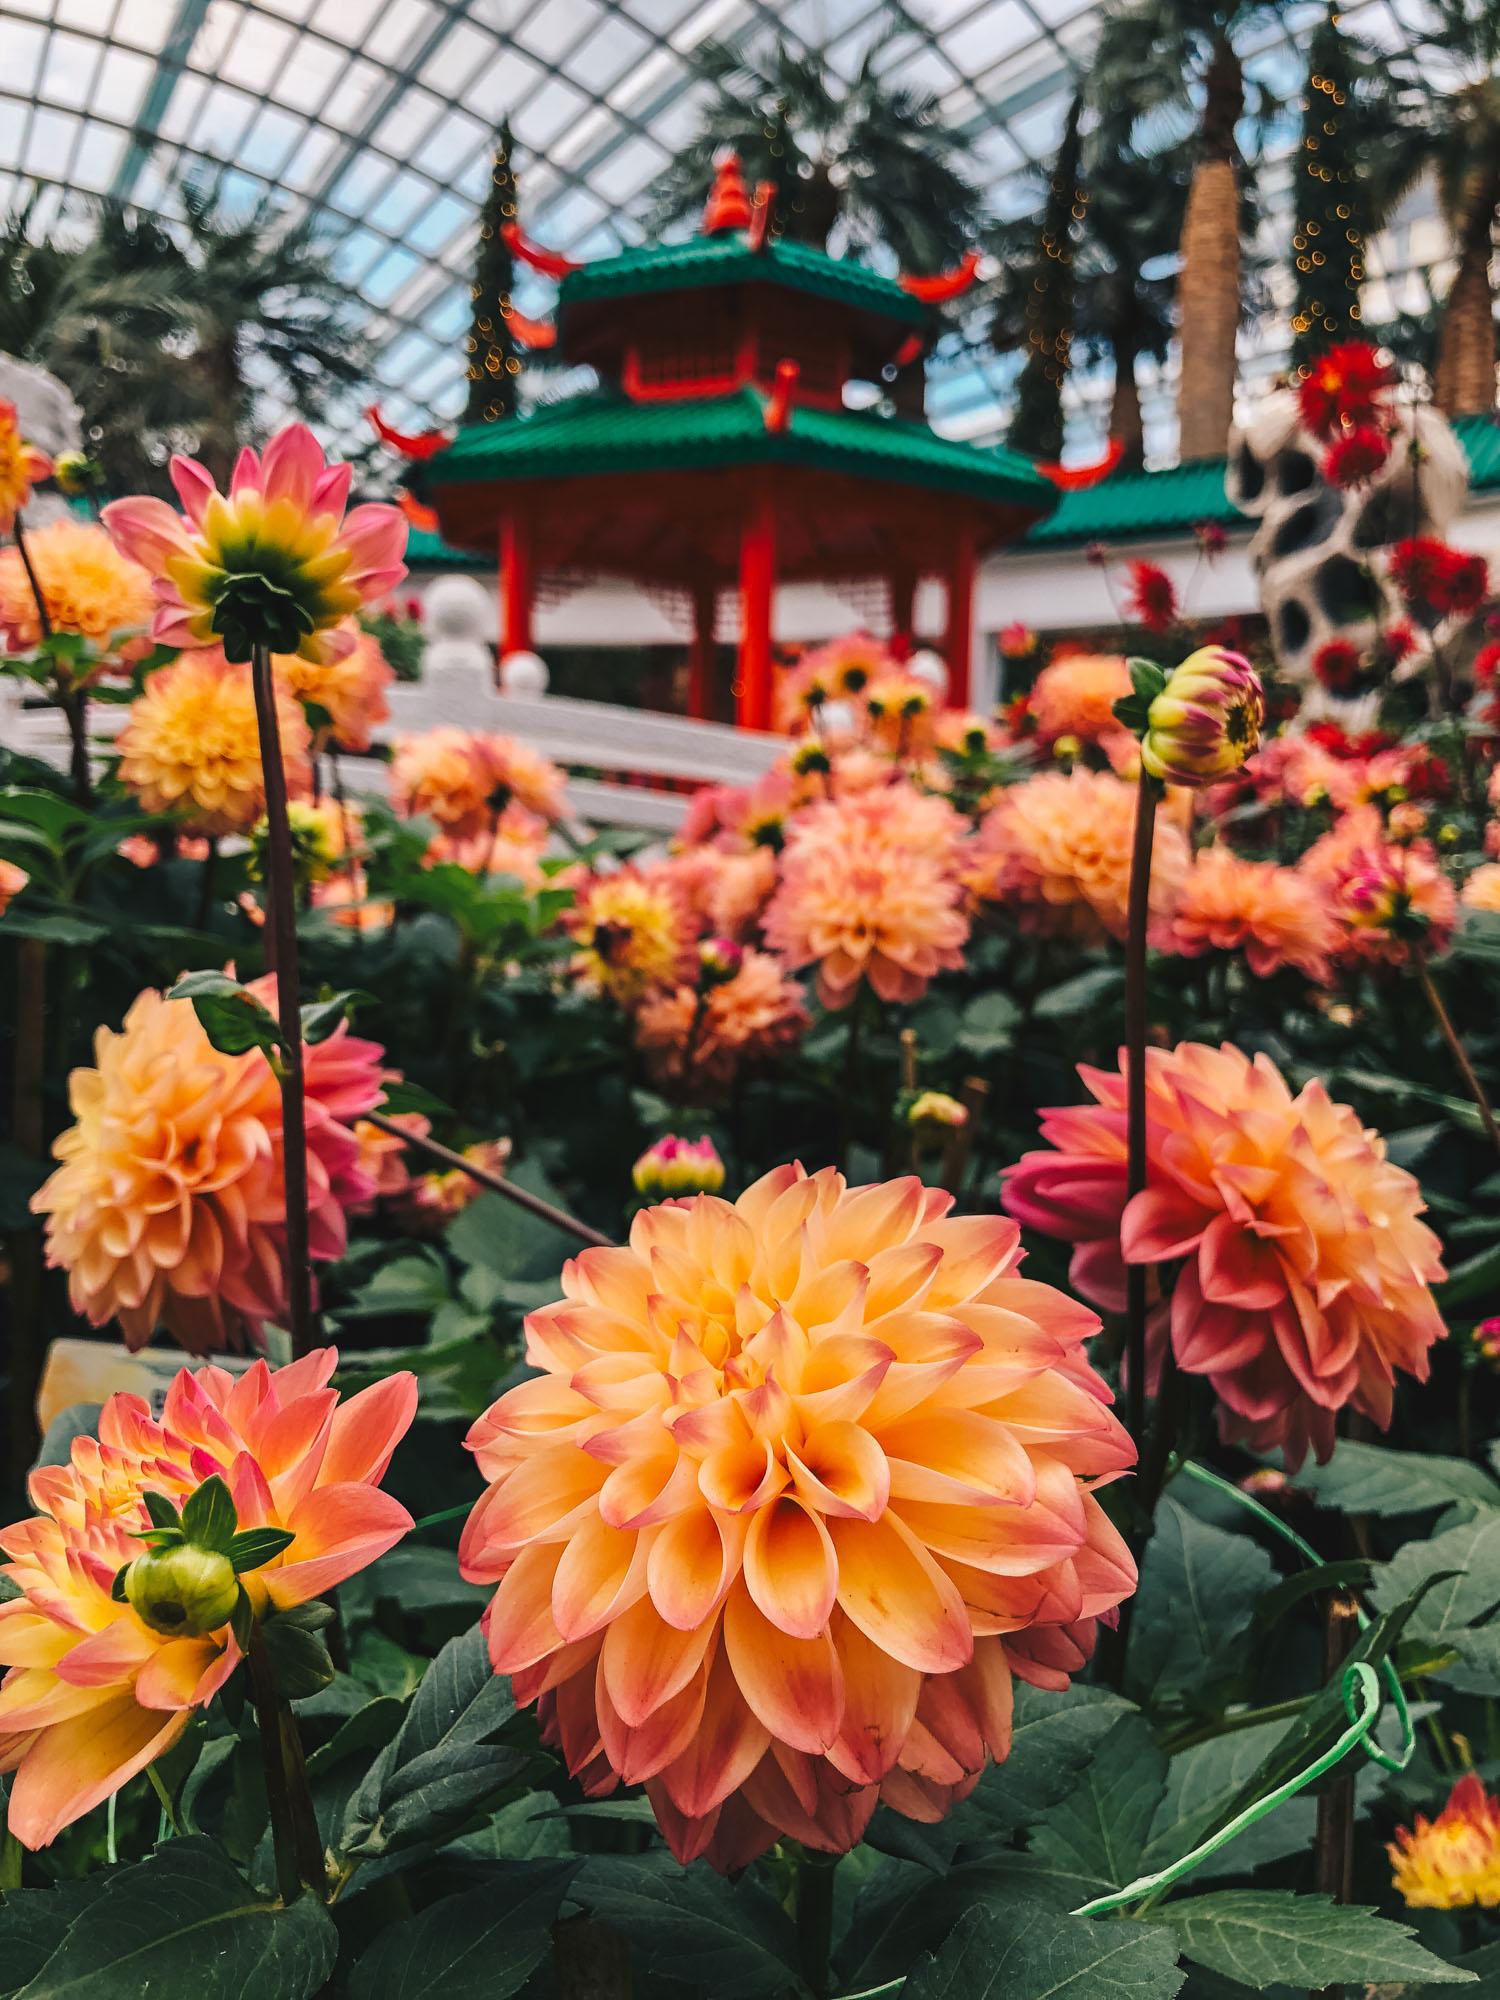 Dahlia Dreams at Gardens by the Bay